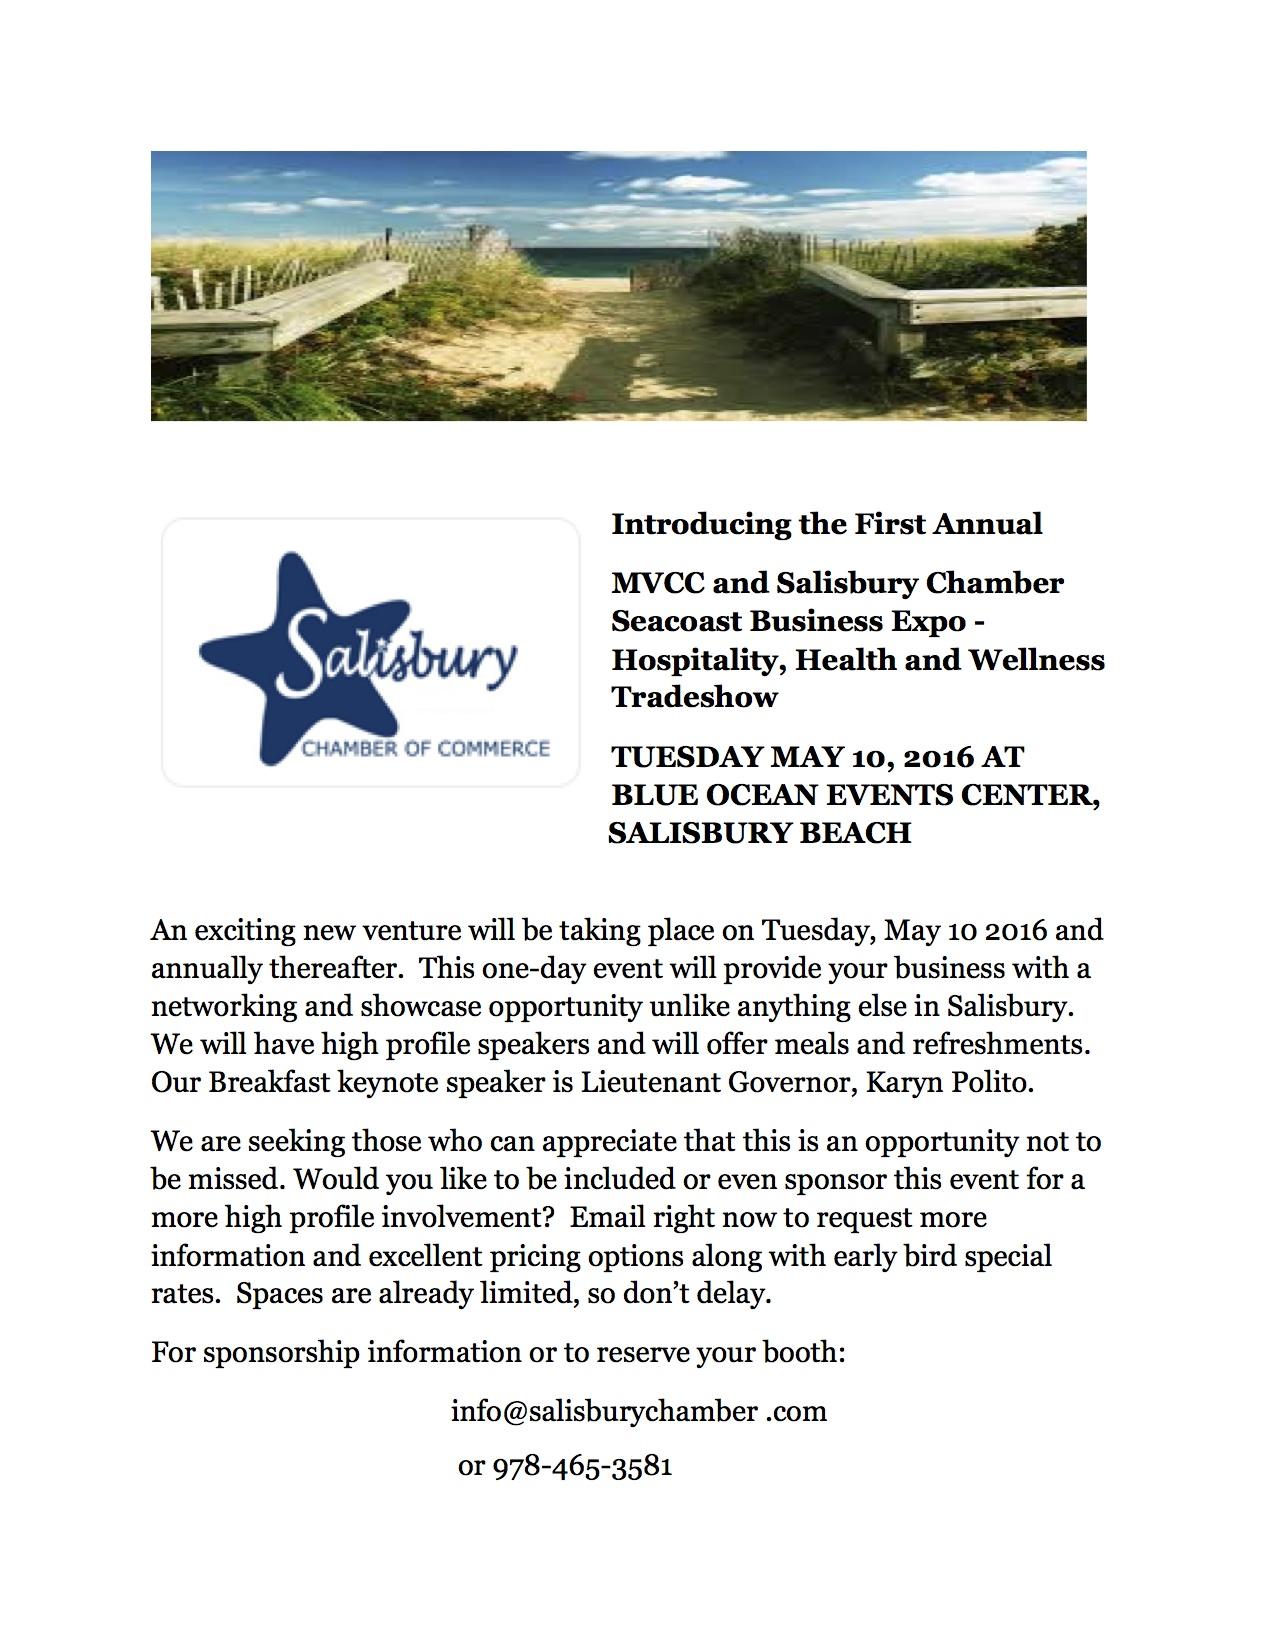 Seacoast Business Expo - Hospitatlity, Heath and Wellness Tradeshow